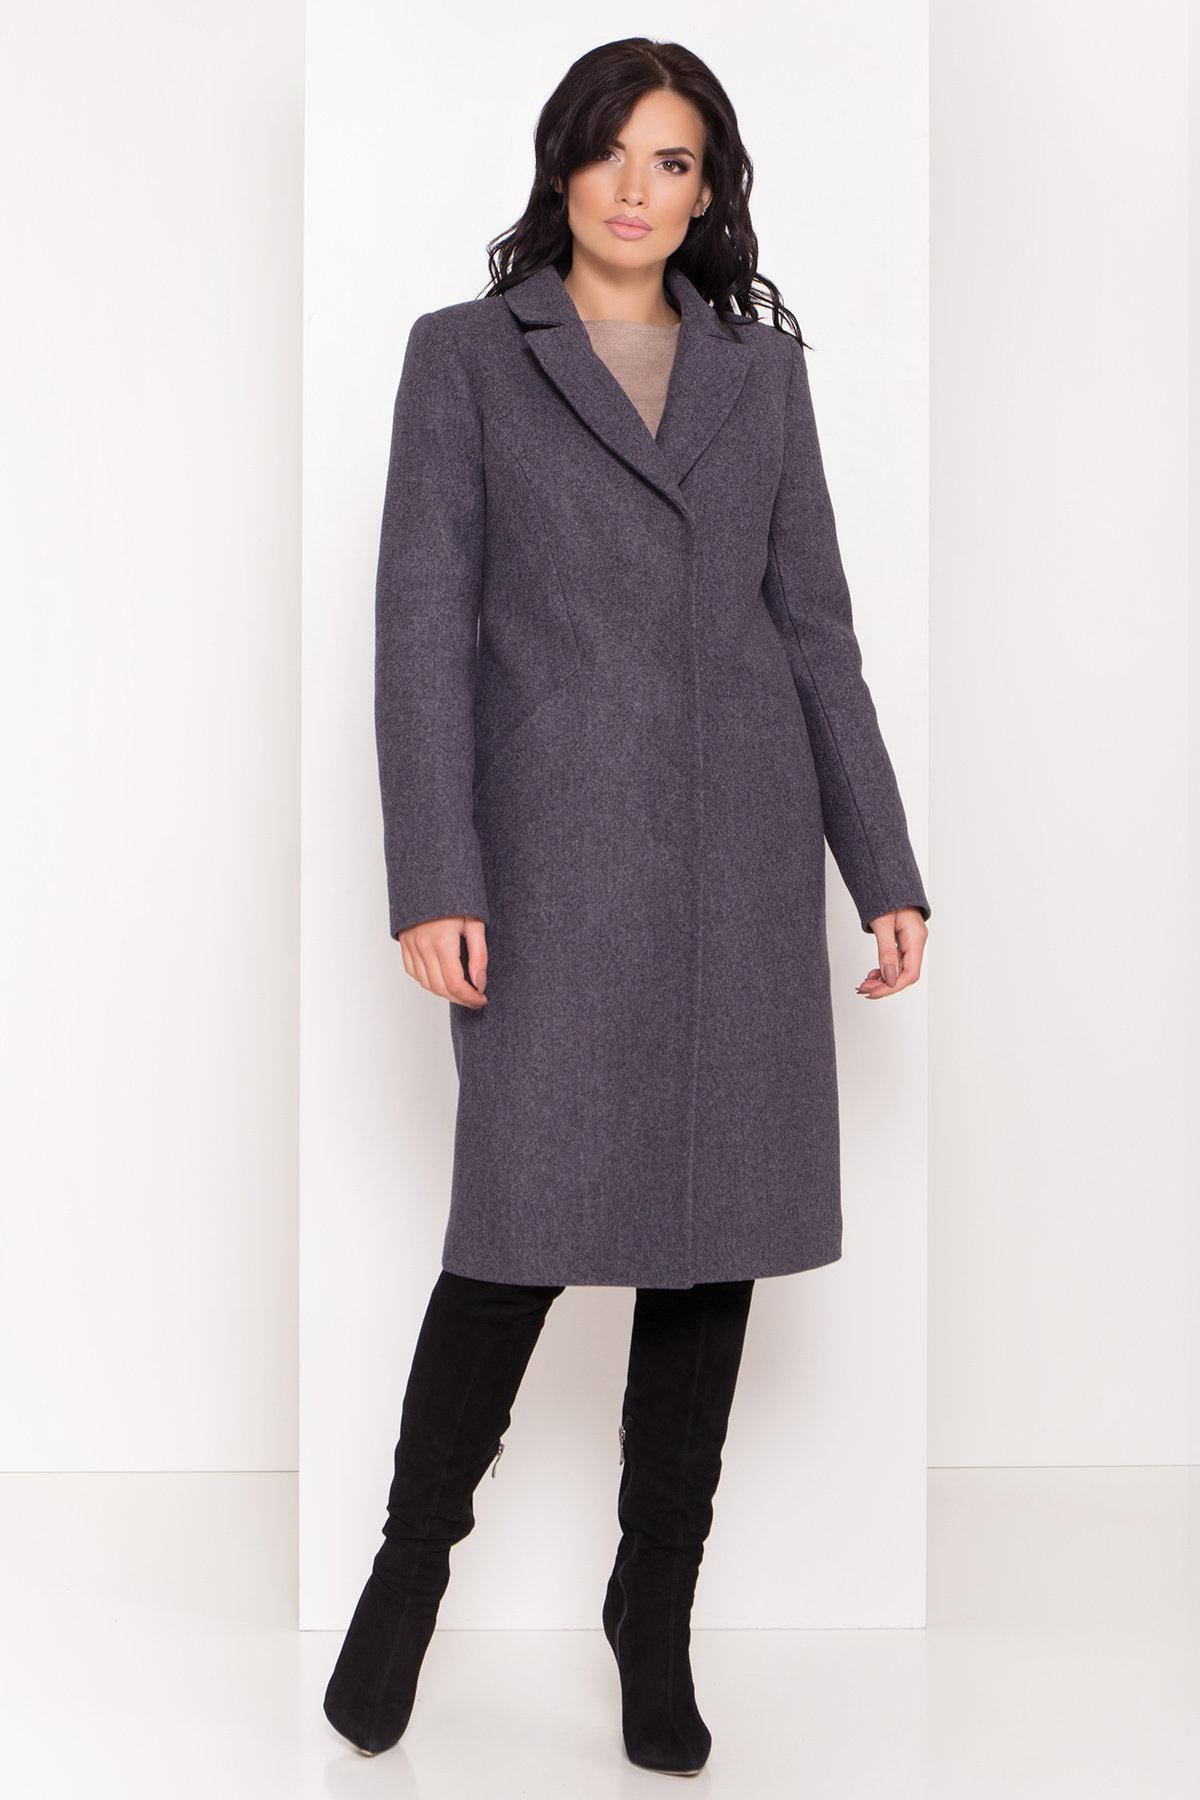 Пальто зима Кареро 8067 АРТ. 44013 Цвет: Т.синий 543 - фото 4, интернет магазин tm-modus.ru